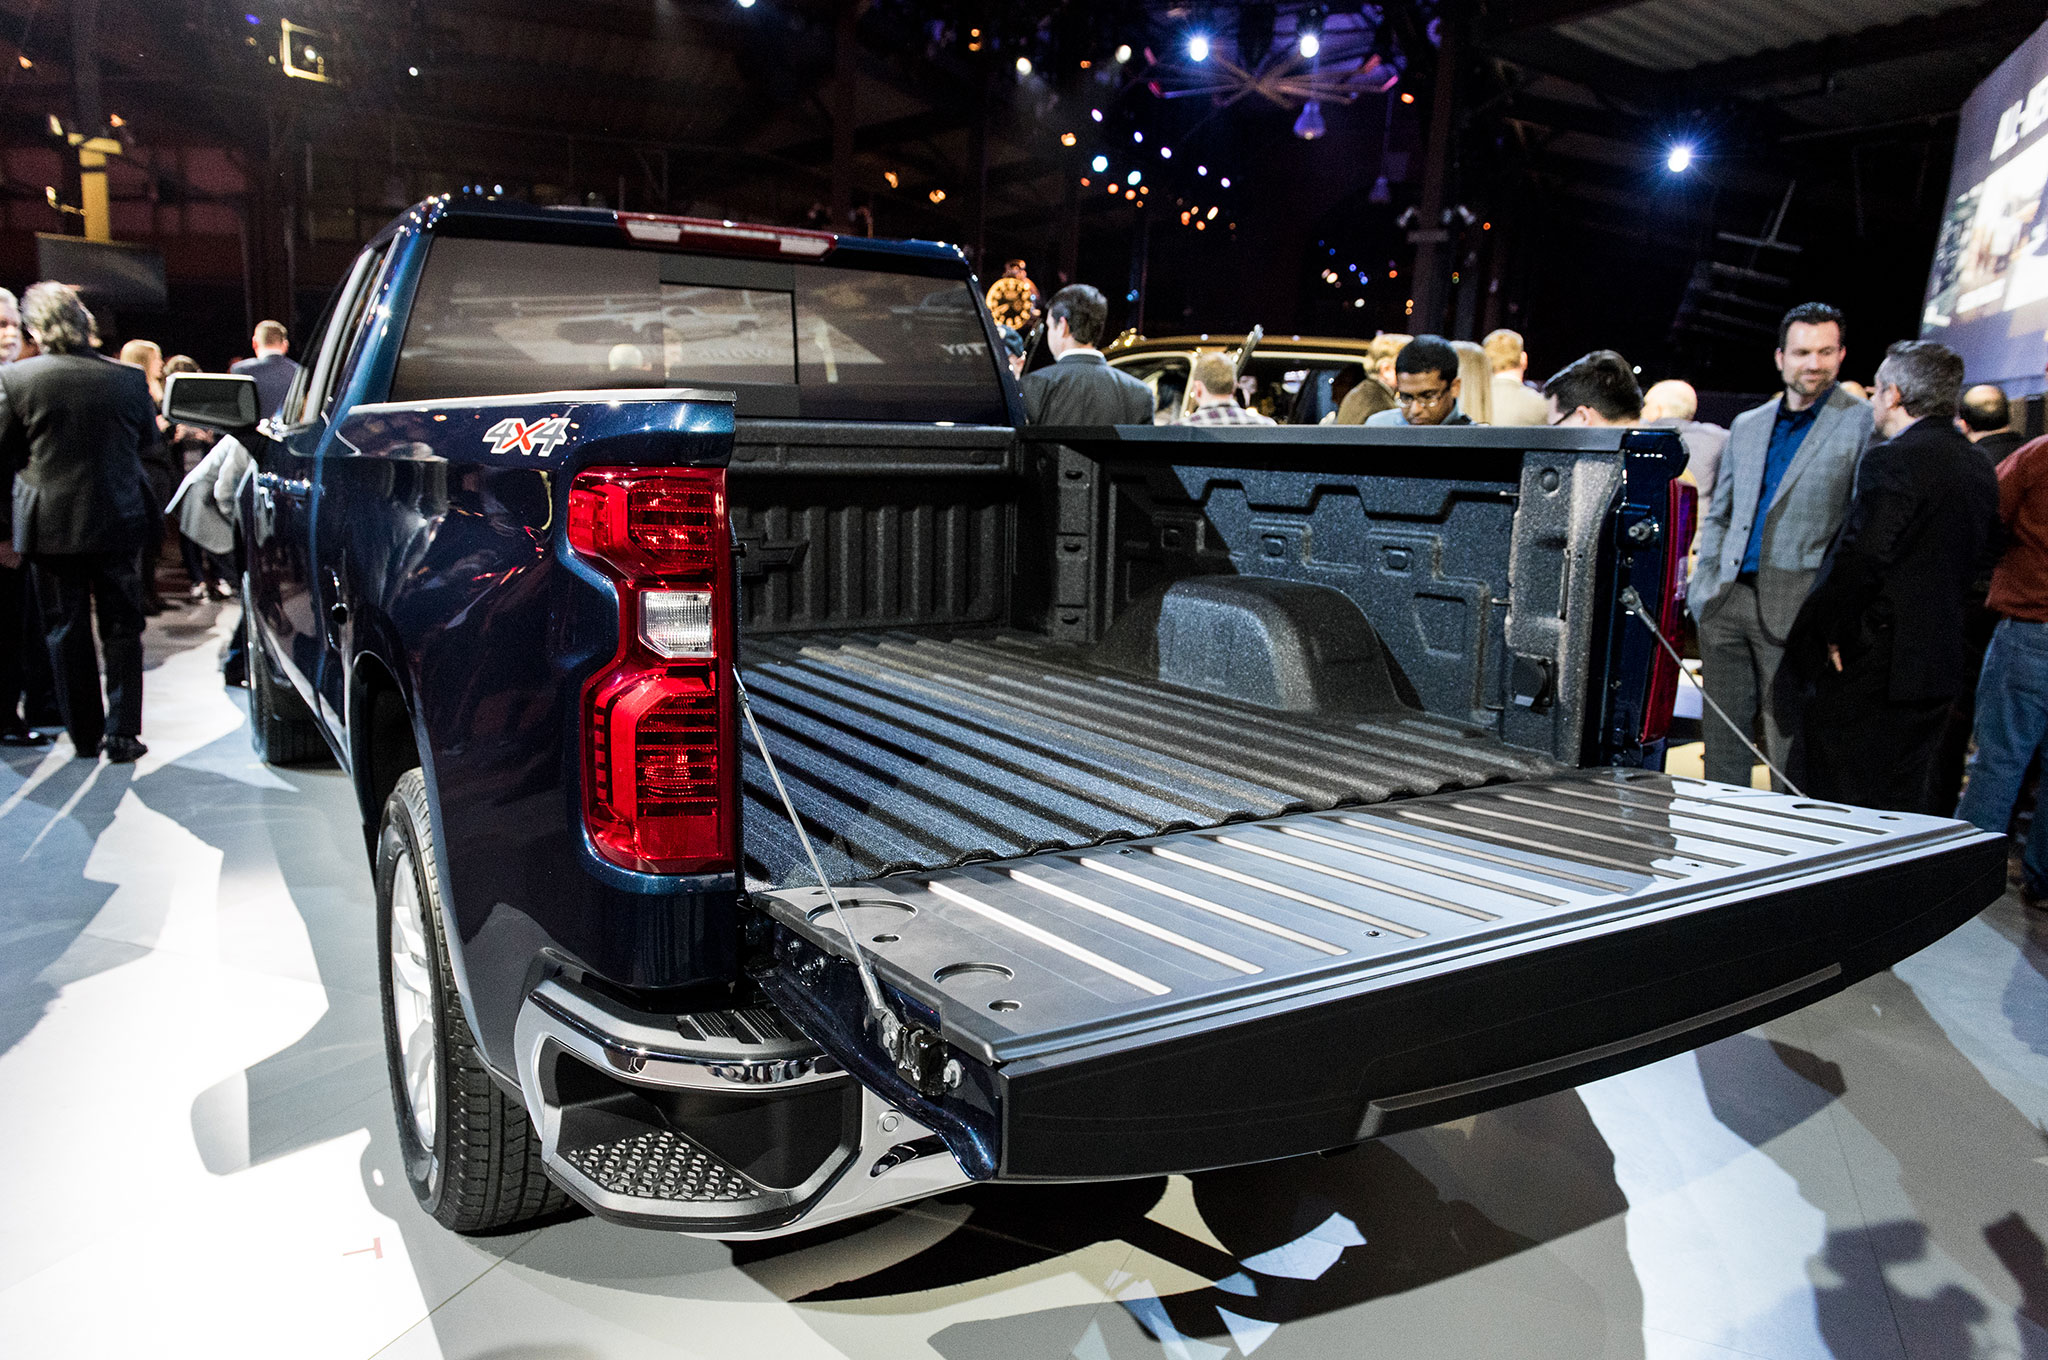 2019 Chevrolet Silverado Lt 4x4 Review A Fine Errand Runner